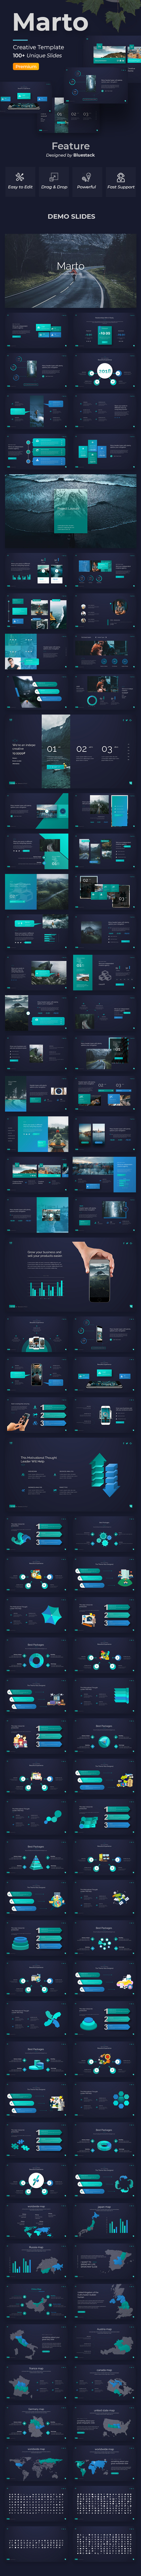 Marto Premium PowerPoint Template - Creative PowerPoint Templates